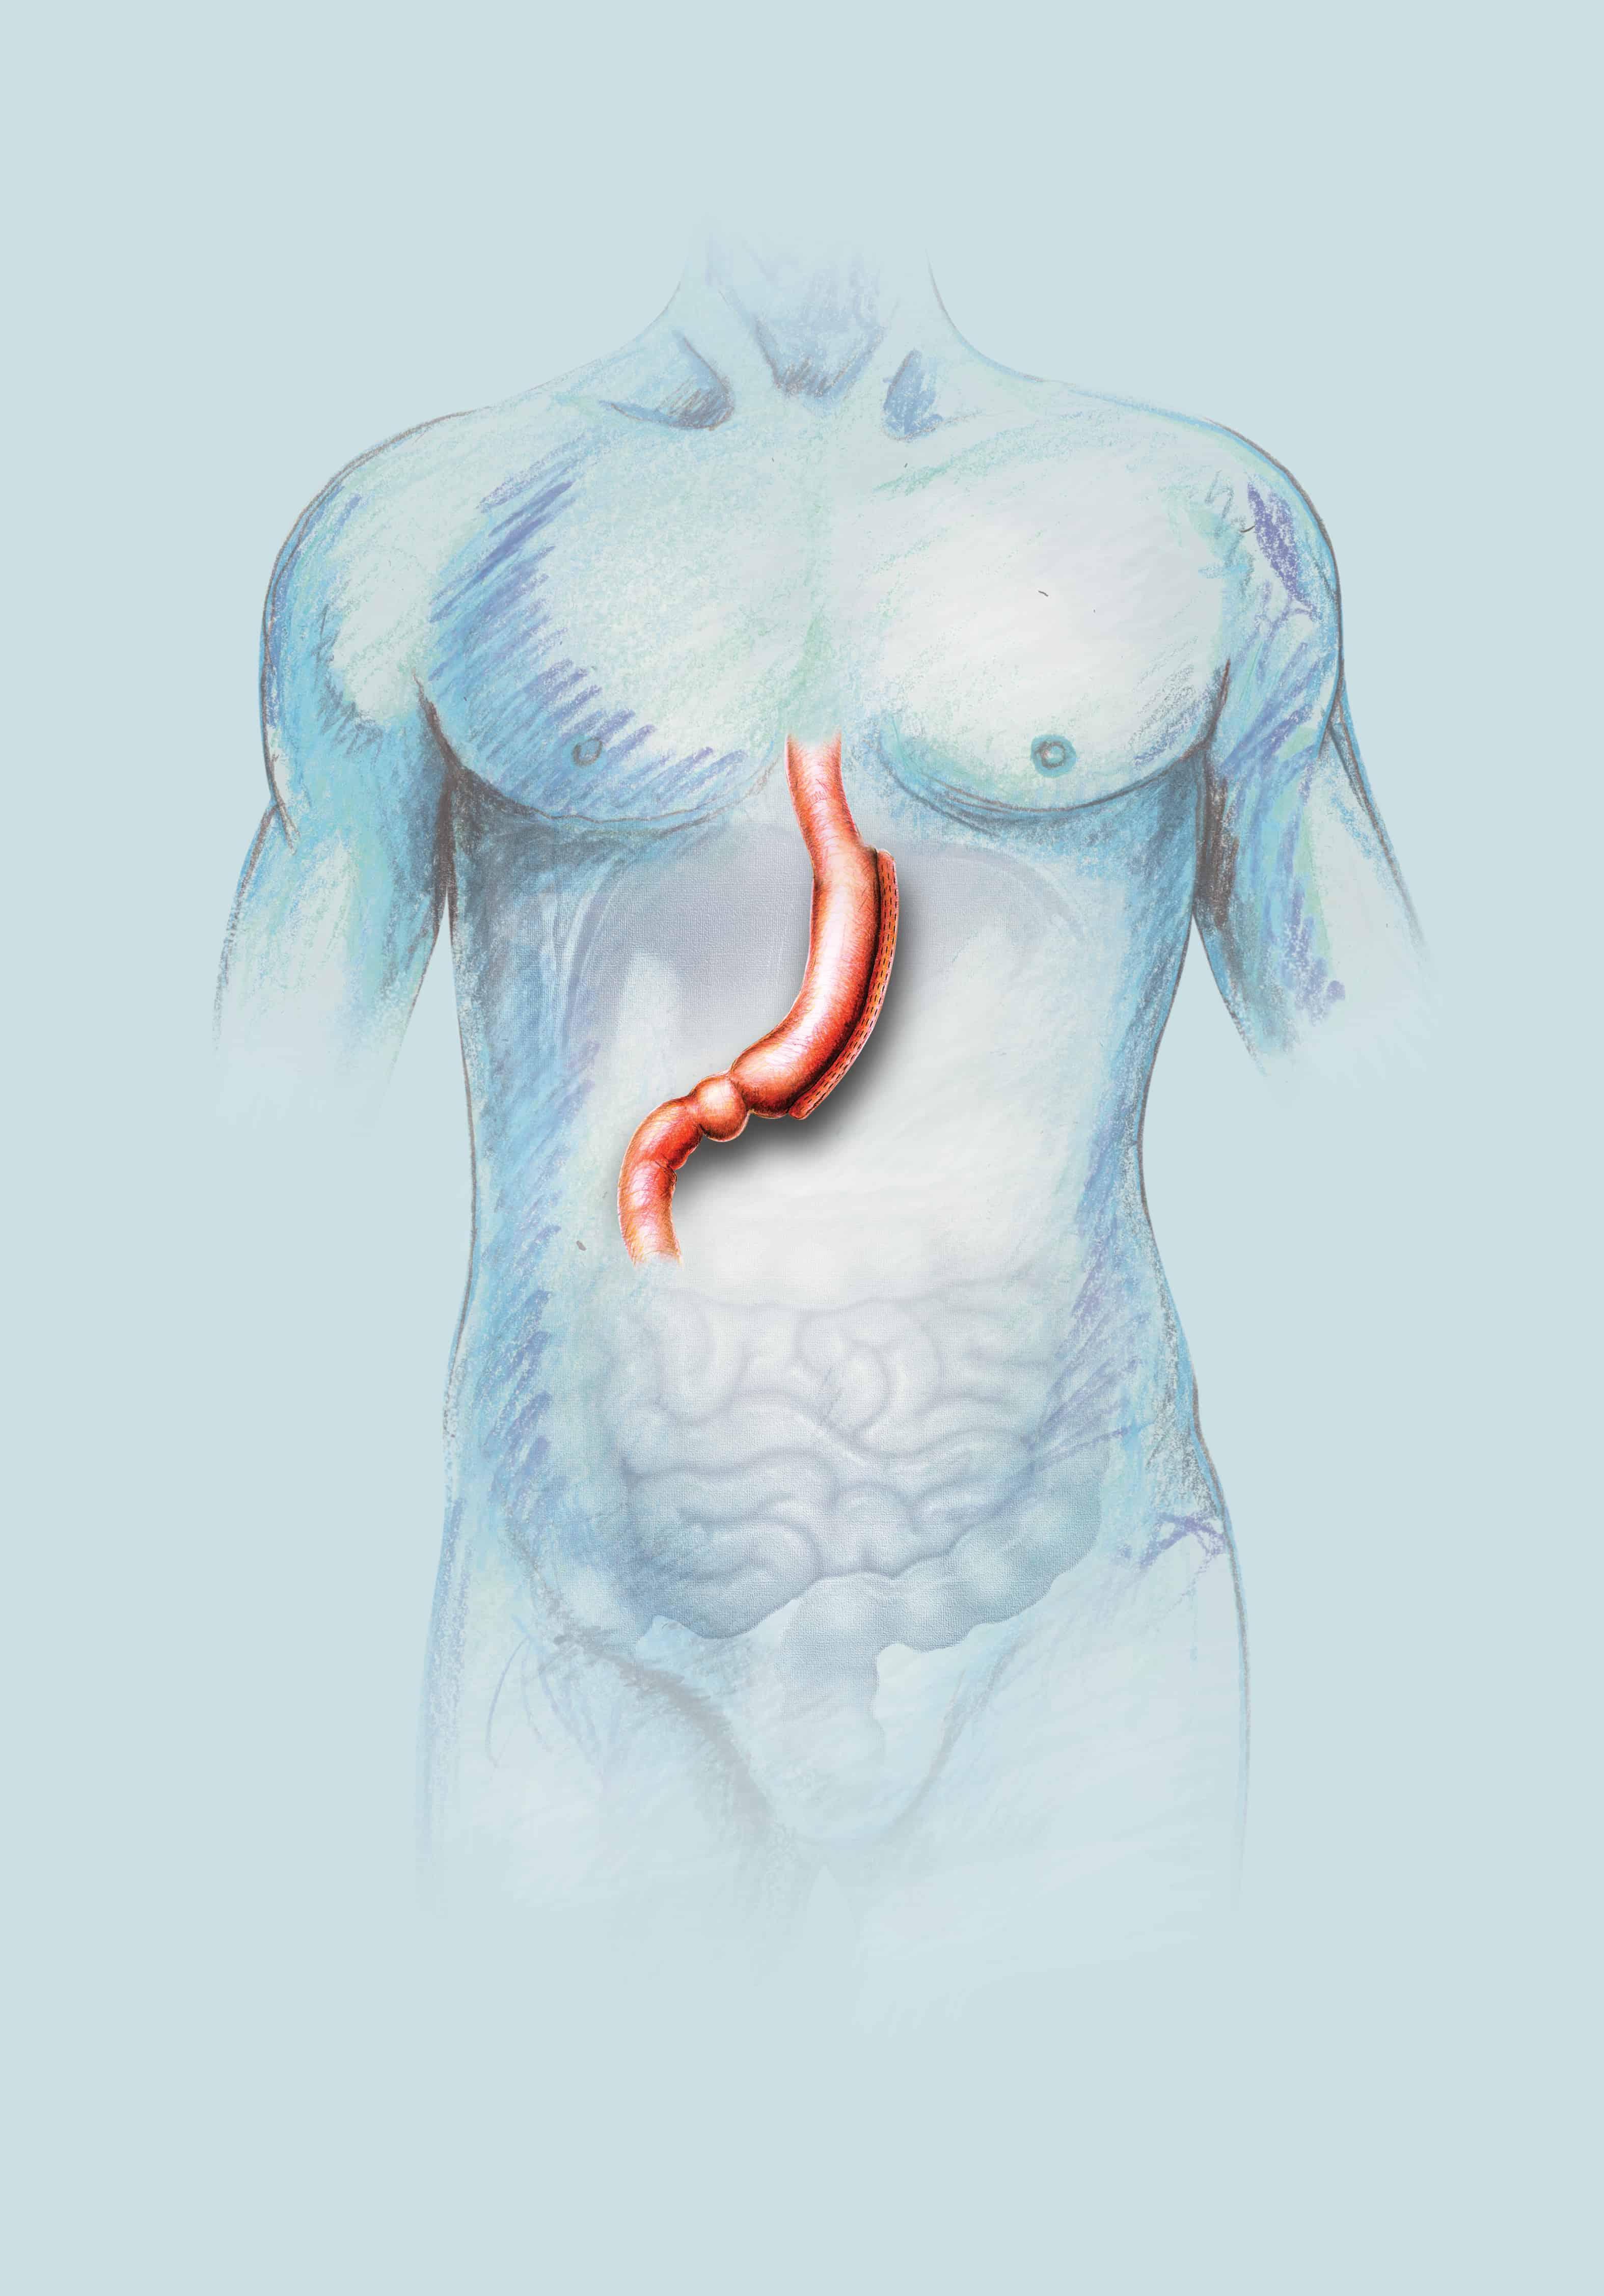 Sleeve Gastrectomy illustration